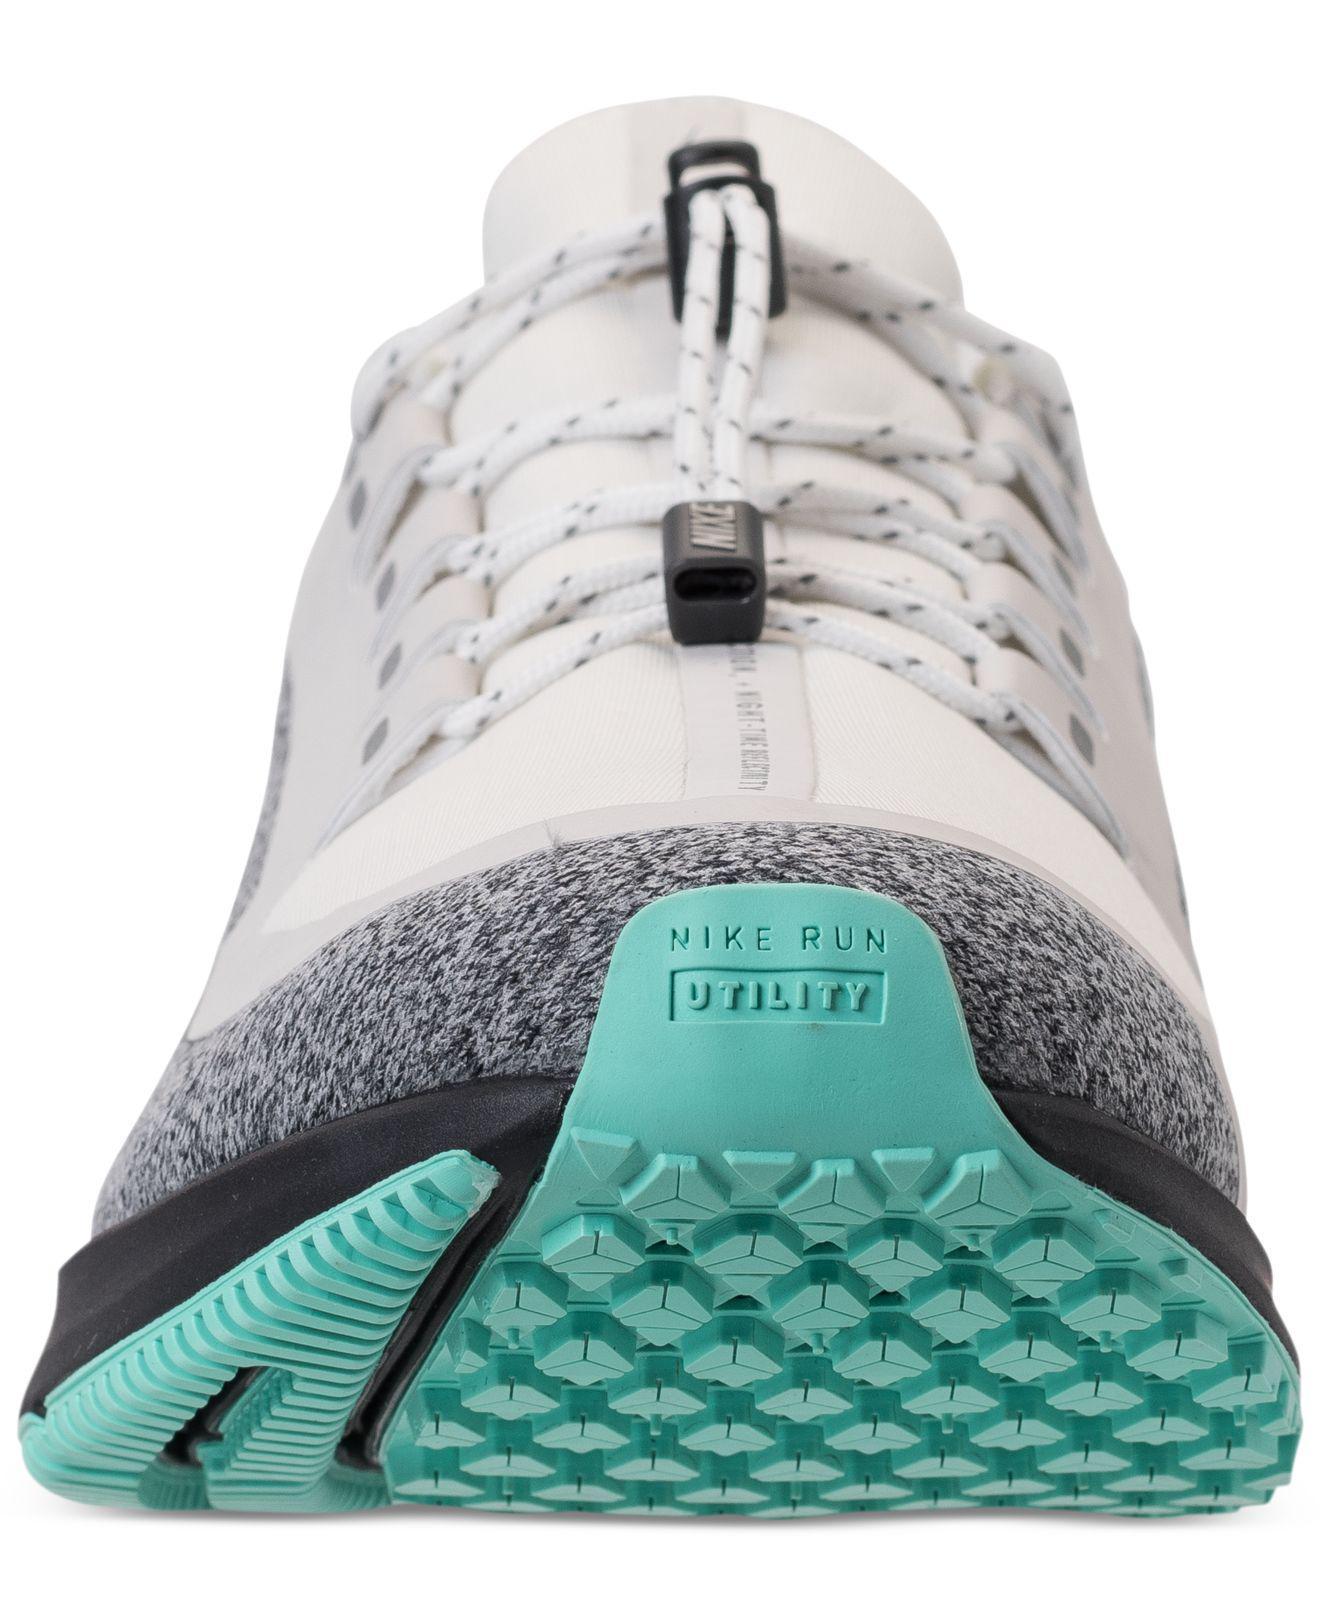 9b2f36d3fd1b06 Nike - Multicolor Air Zoom Pegasus 35 Shield Running Sneakers From Finish  Line - Lyst. View fullscreen